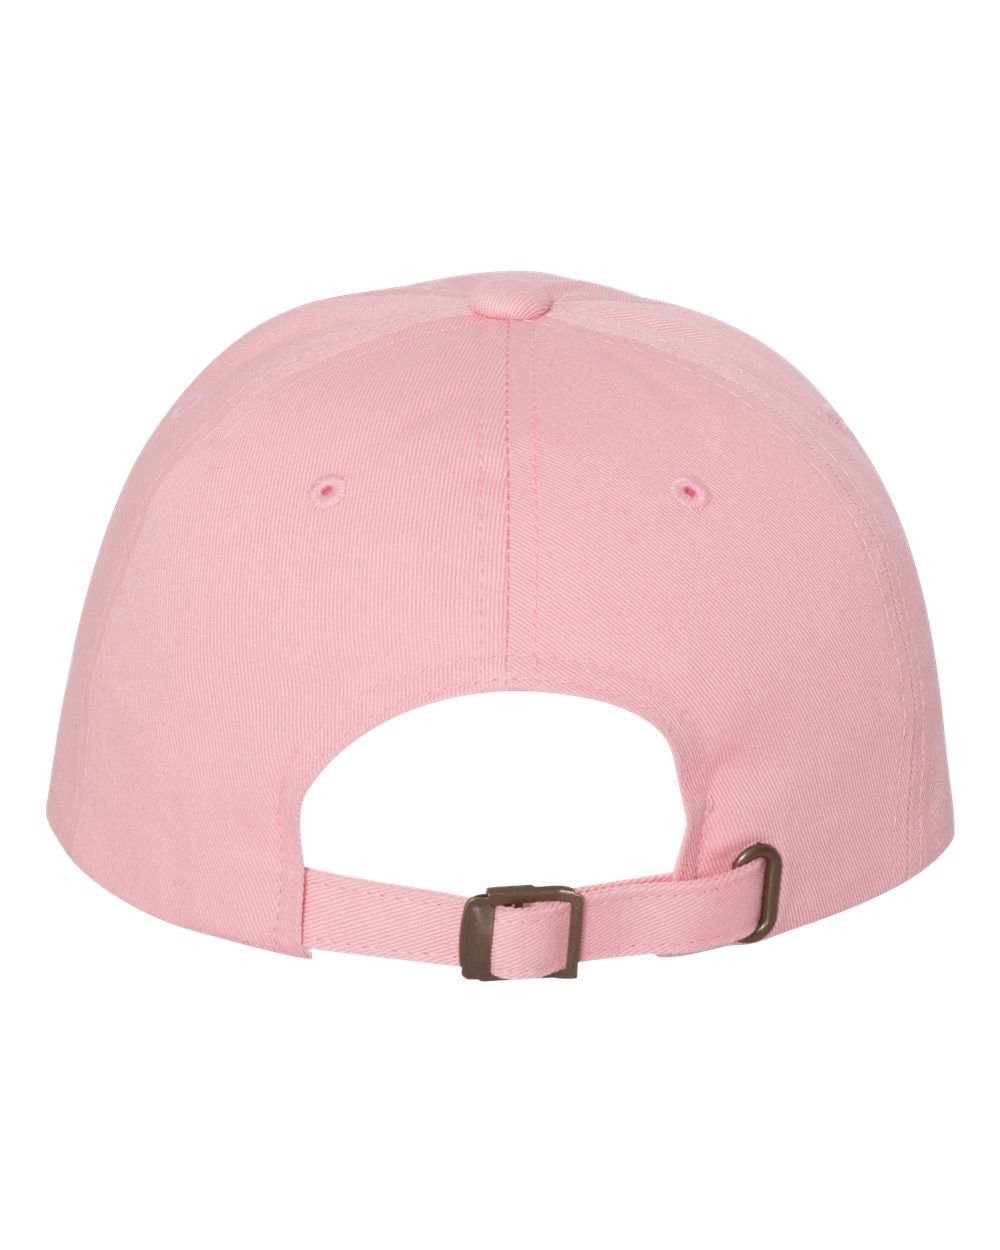 Image of Mom Bod Hat Pink